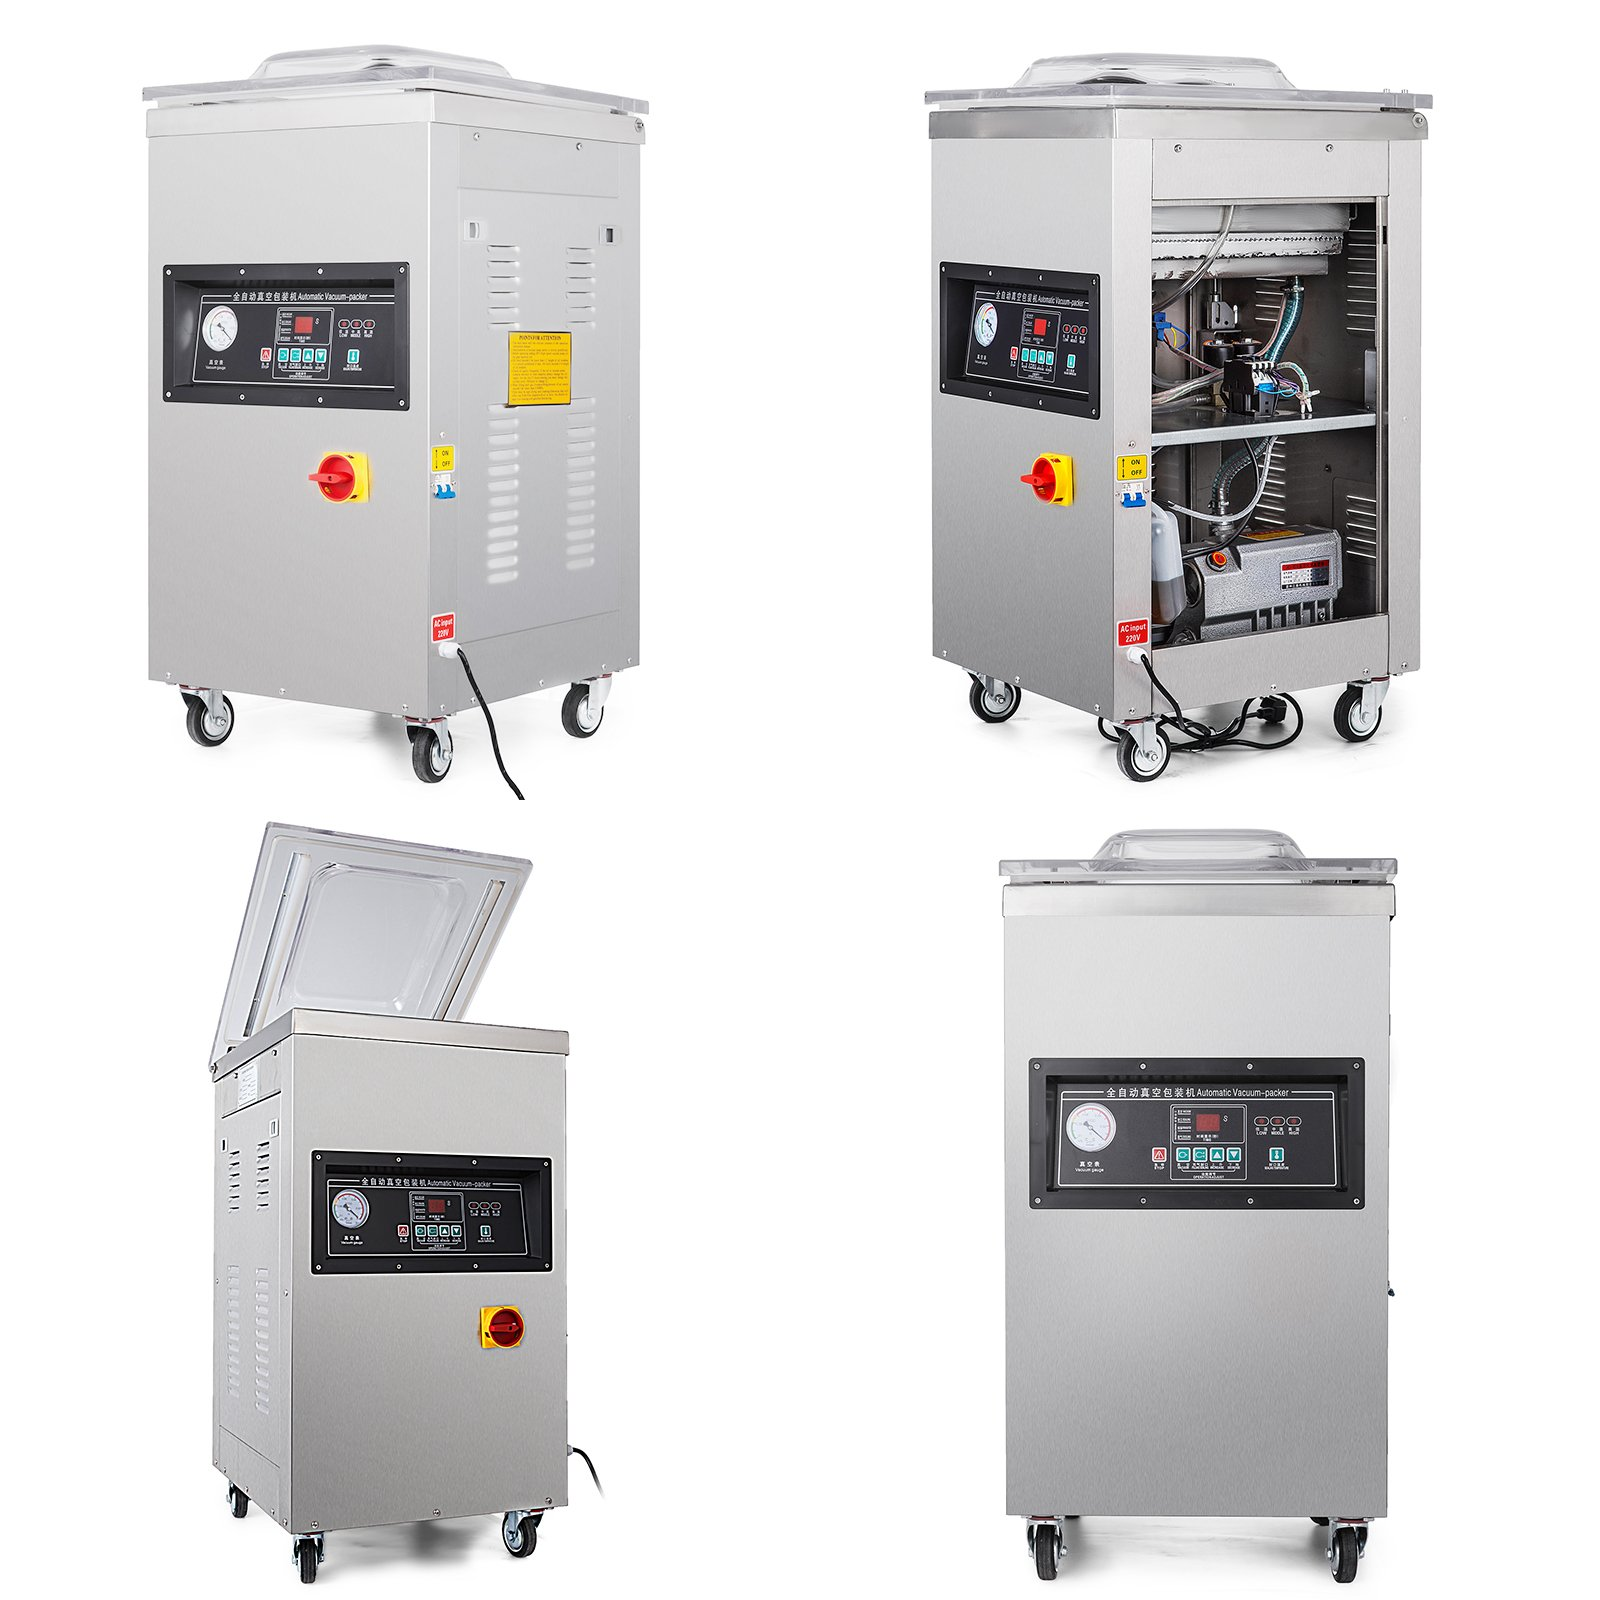 Happybuy DZ-400/2E Chamber Vacuum Sealer 1000W Vacuum Sealer Machine Automatic Vacuum Packing Sealing Sealer Machine for Home or Commercial Use (DZ-400/2E) by Happybuy (Image #5)